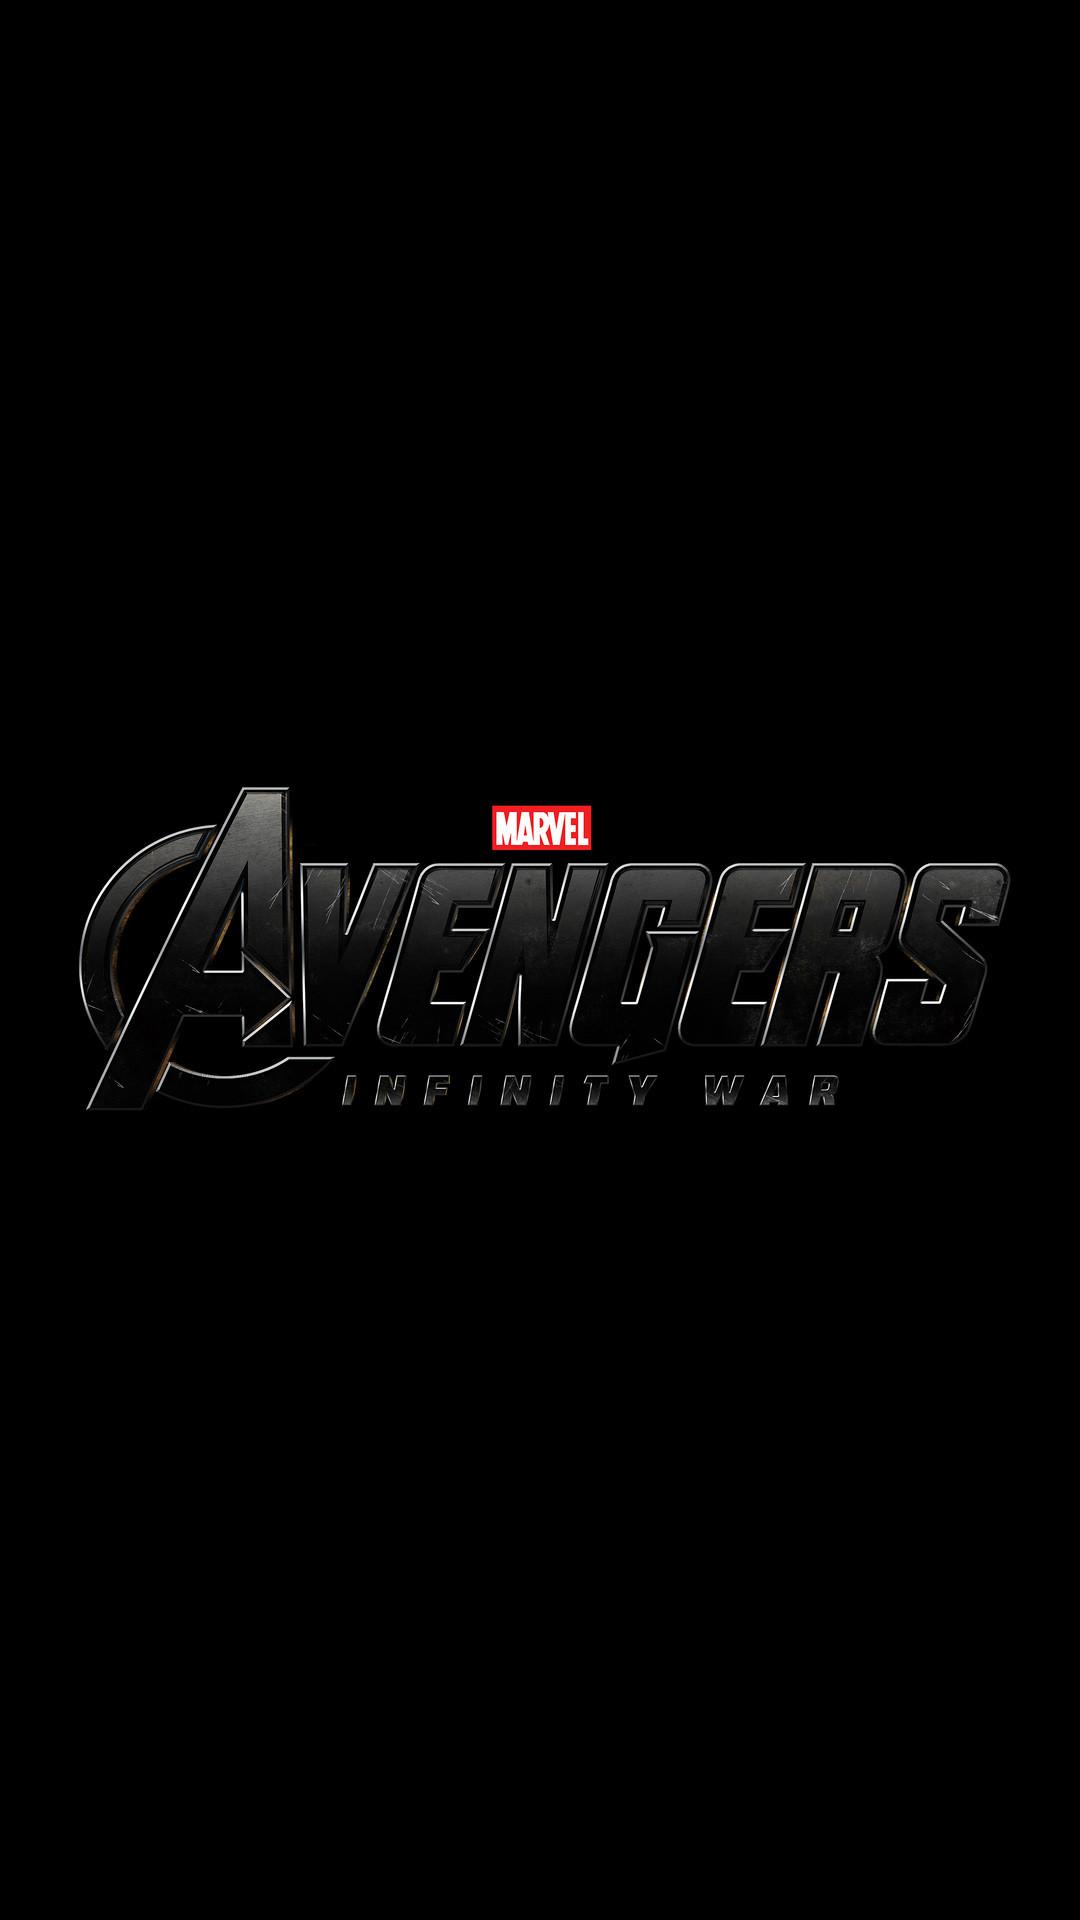 Res: 1080x1920, Avengers Infinity War logo